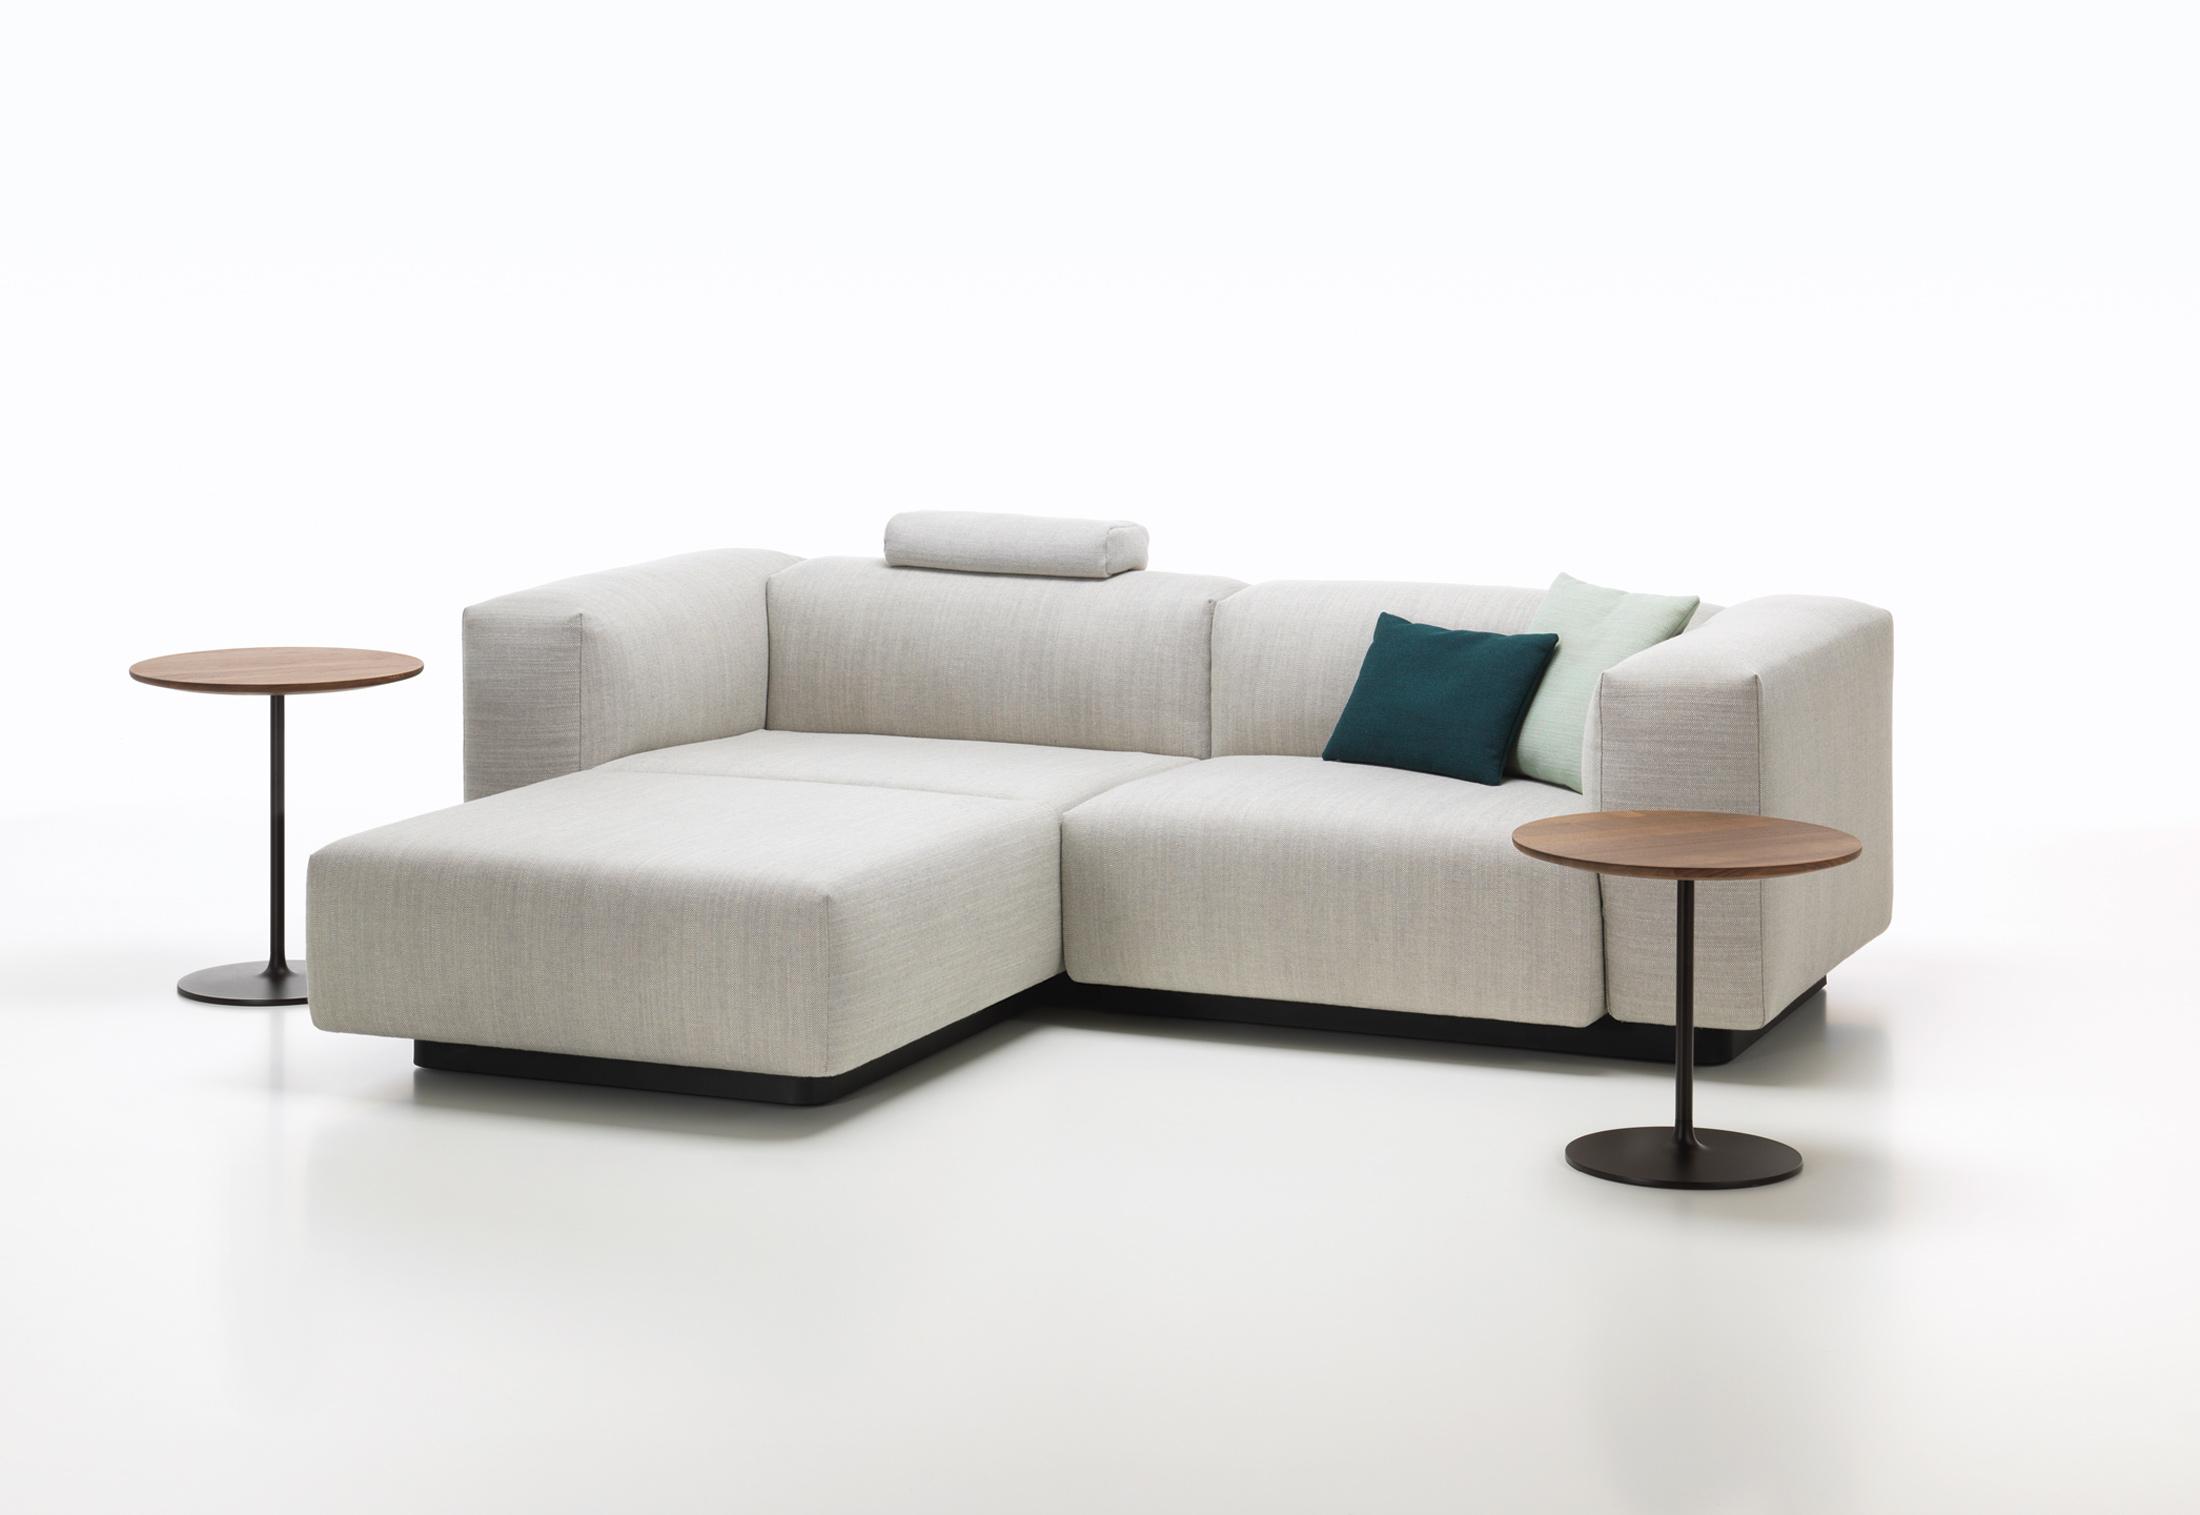 vitra sofa modular best corner beds uk soft by stylepark